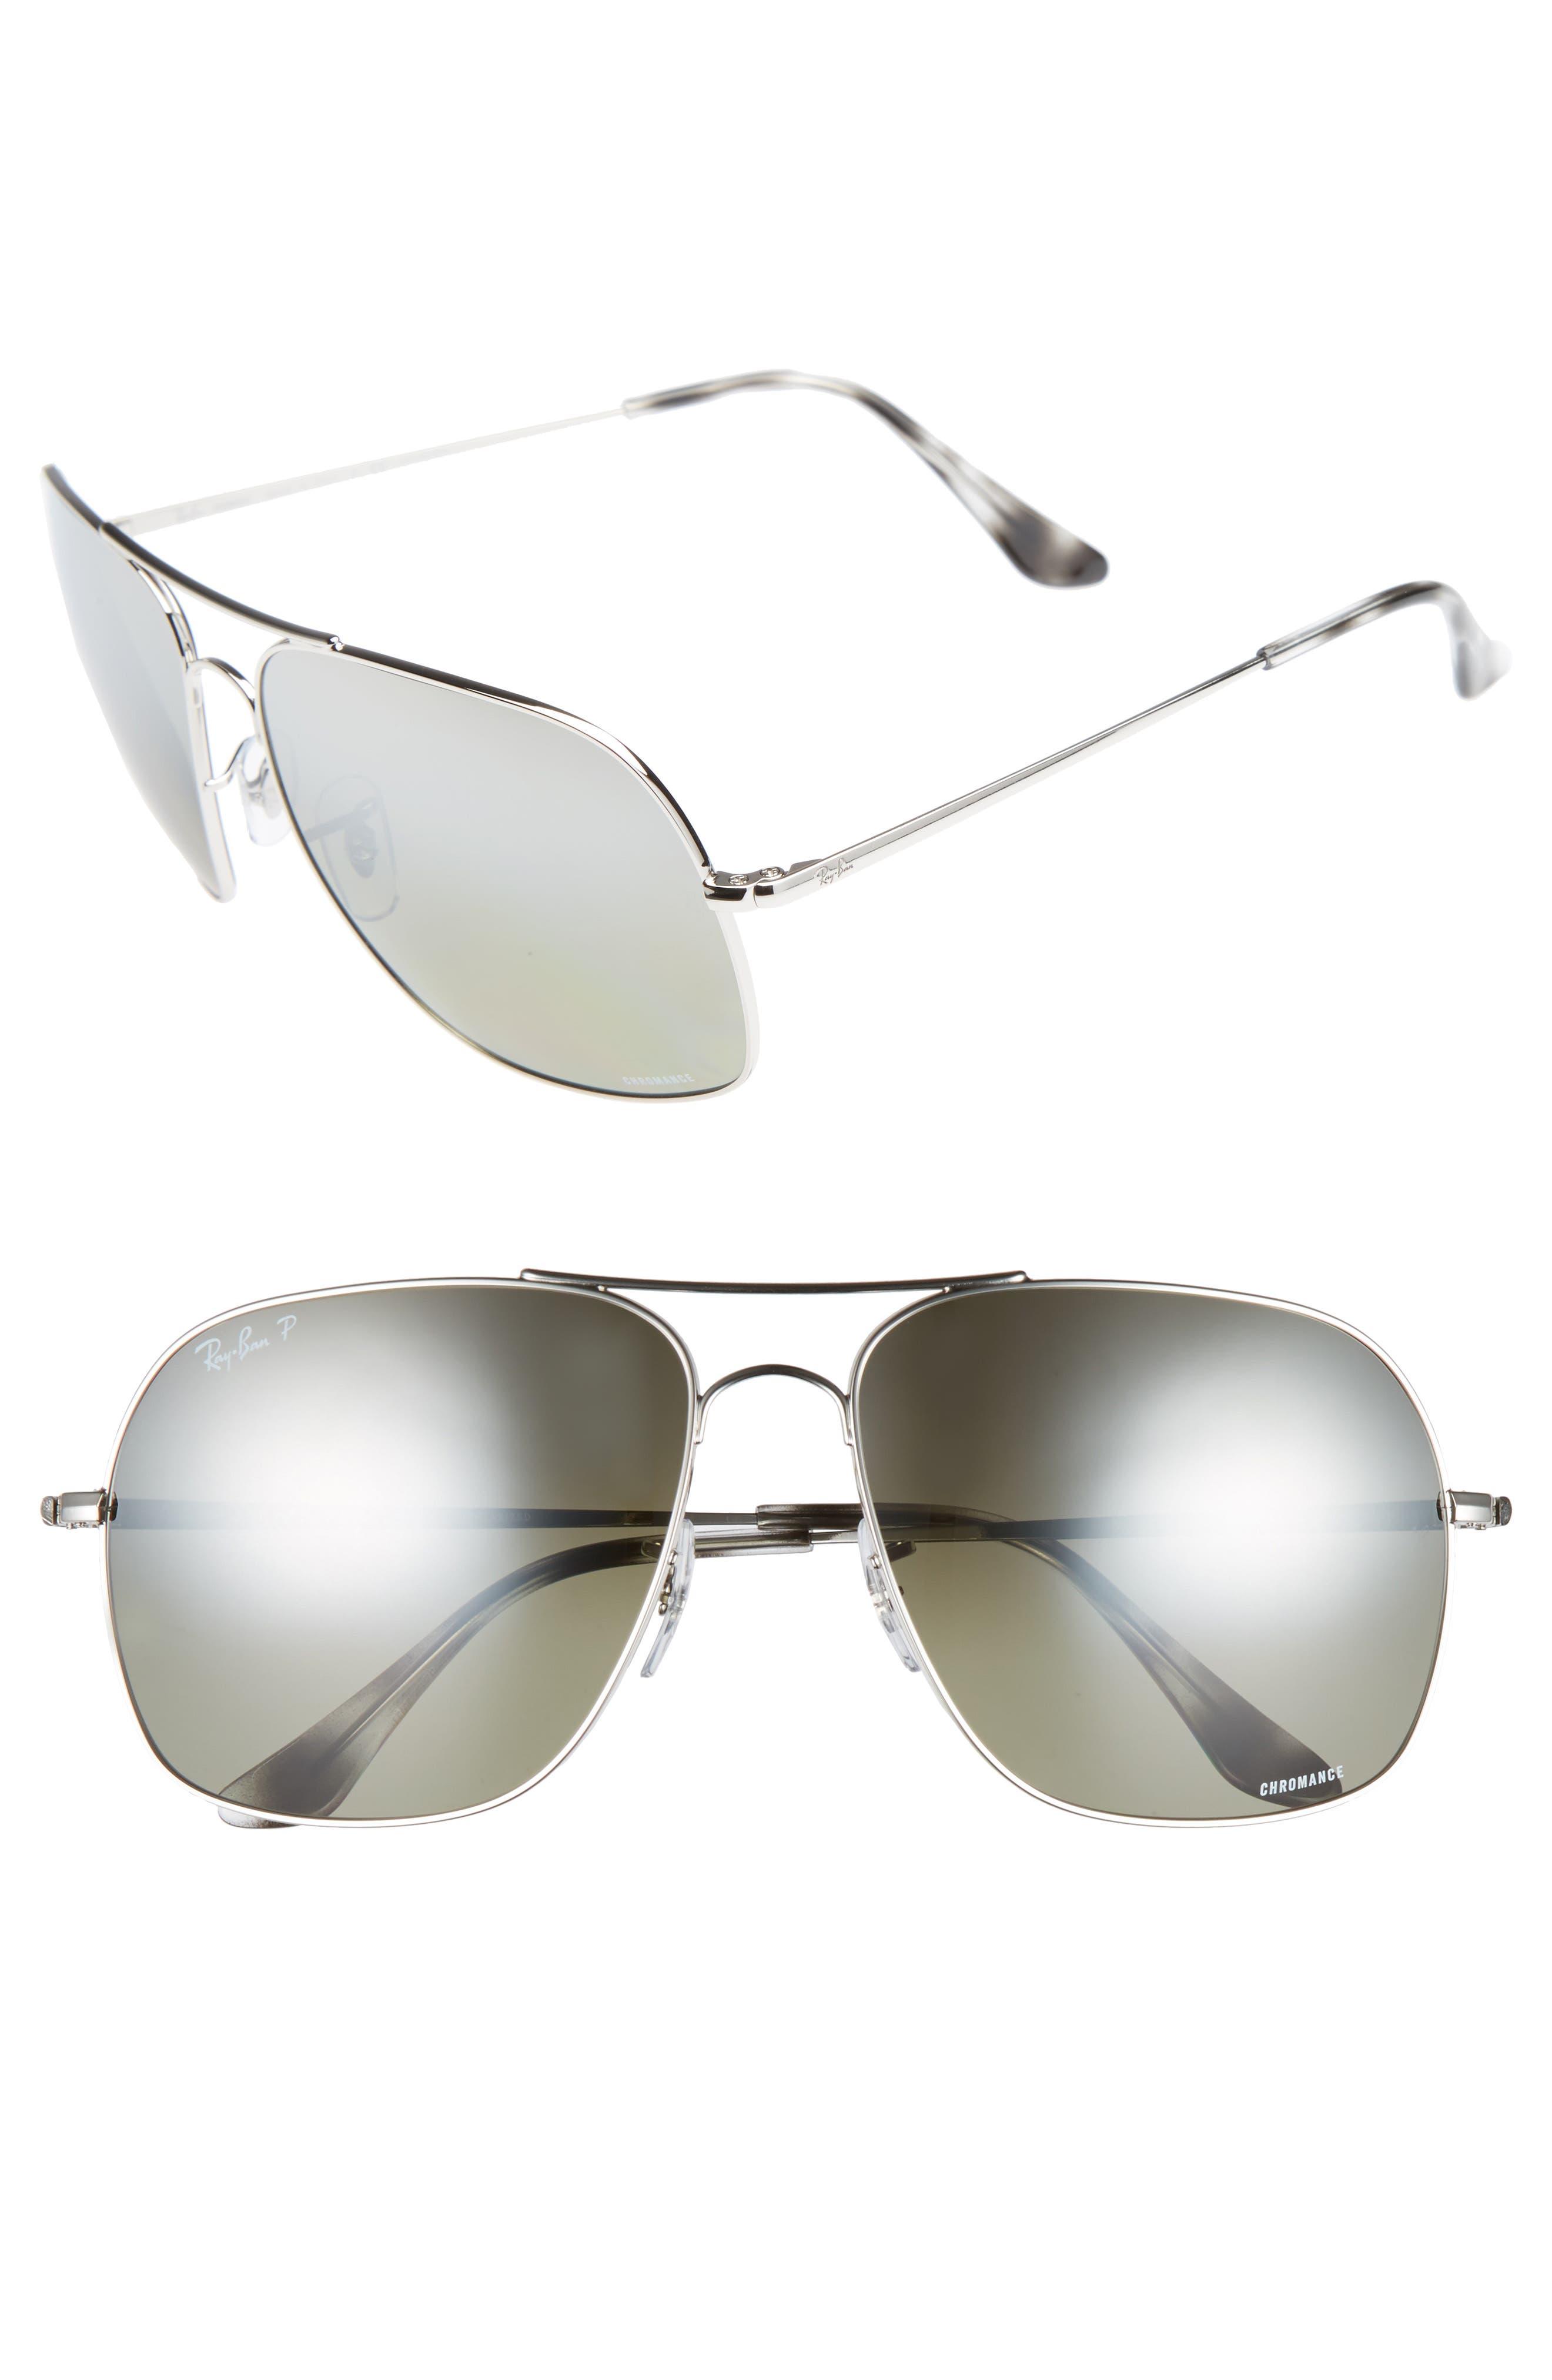 Ray-Ban 61mm Mirrored Lens Polarized Aviator Sunglasses